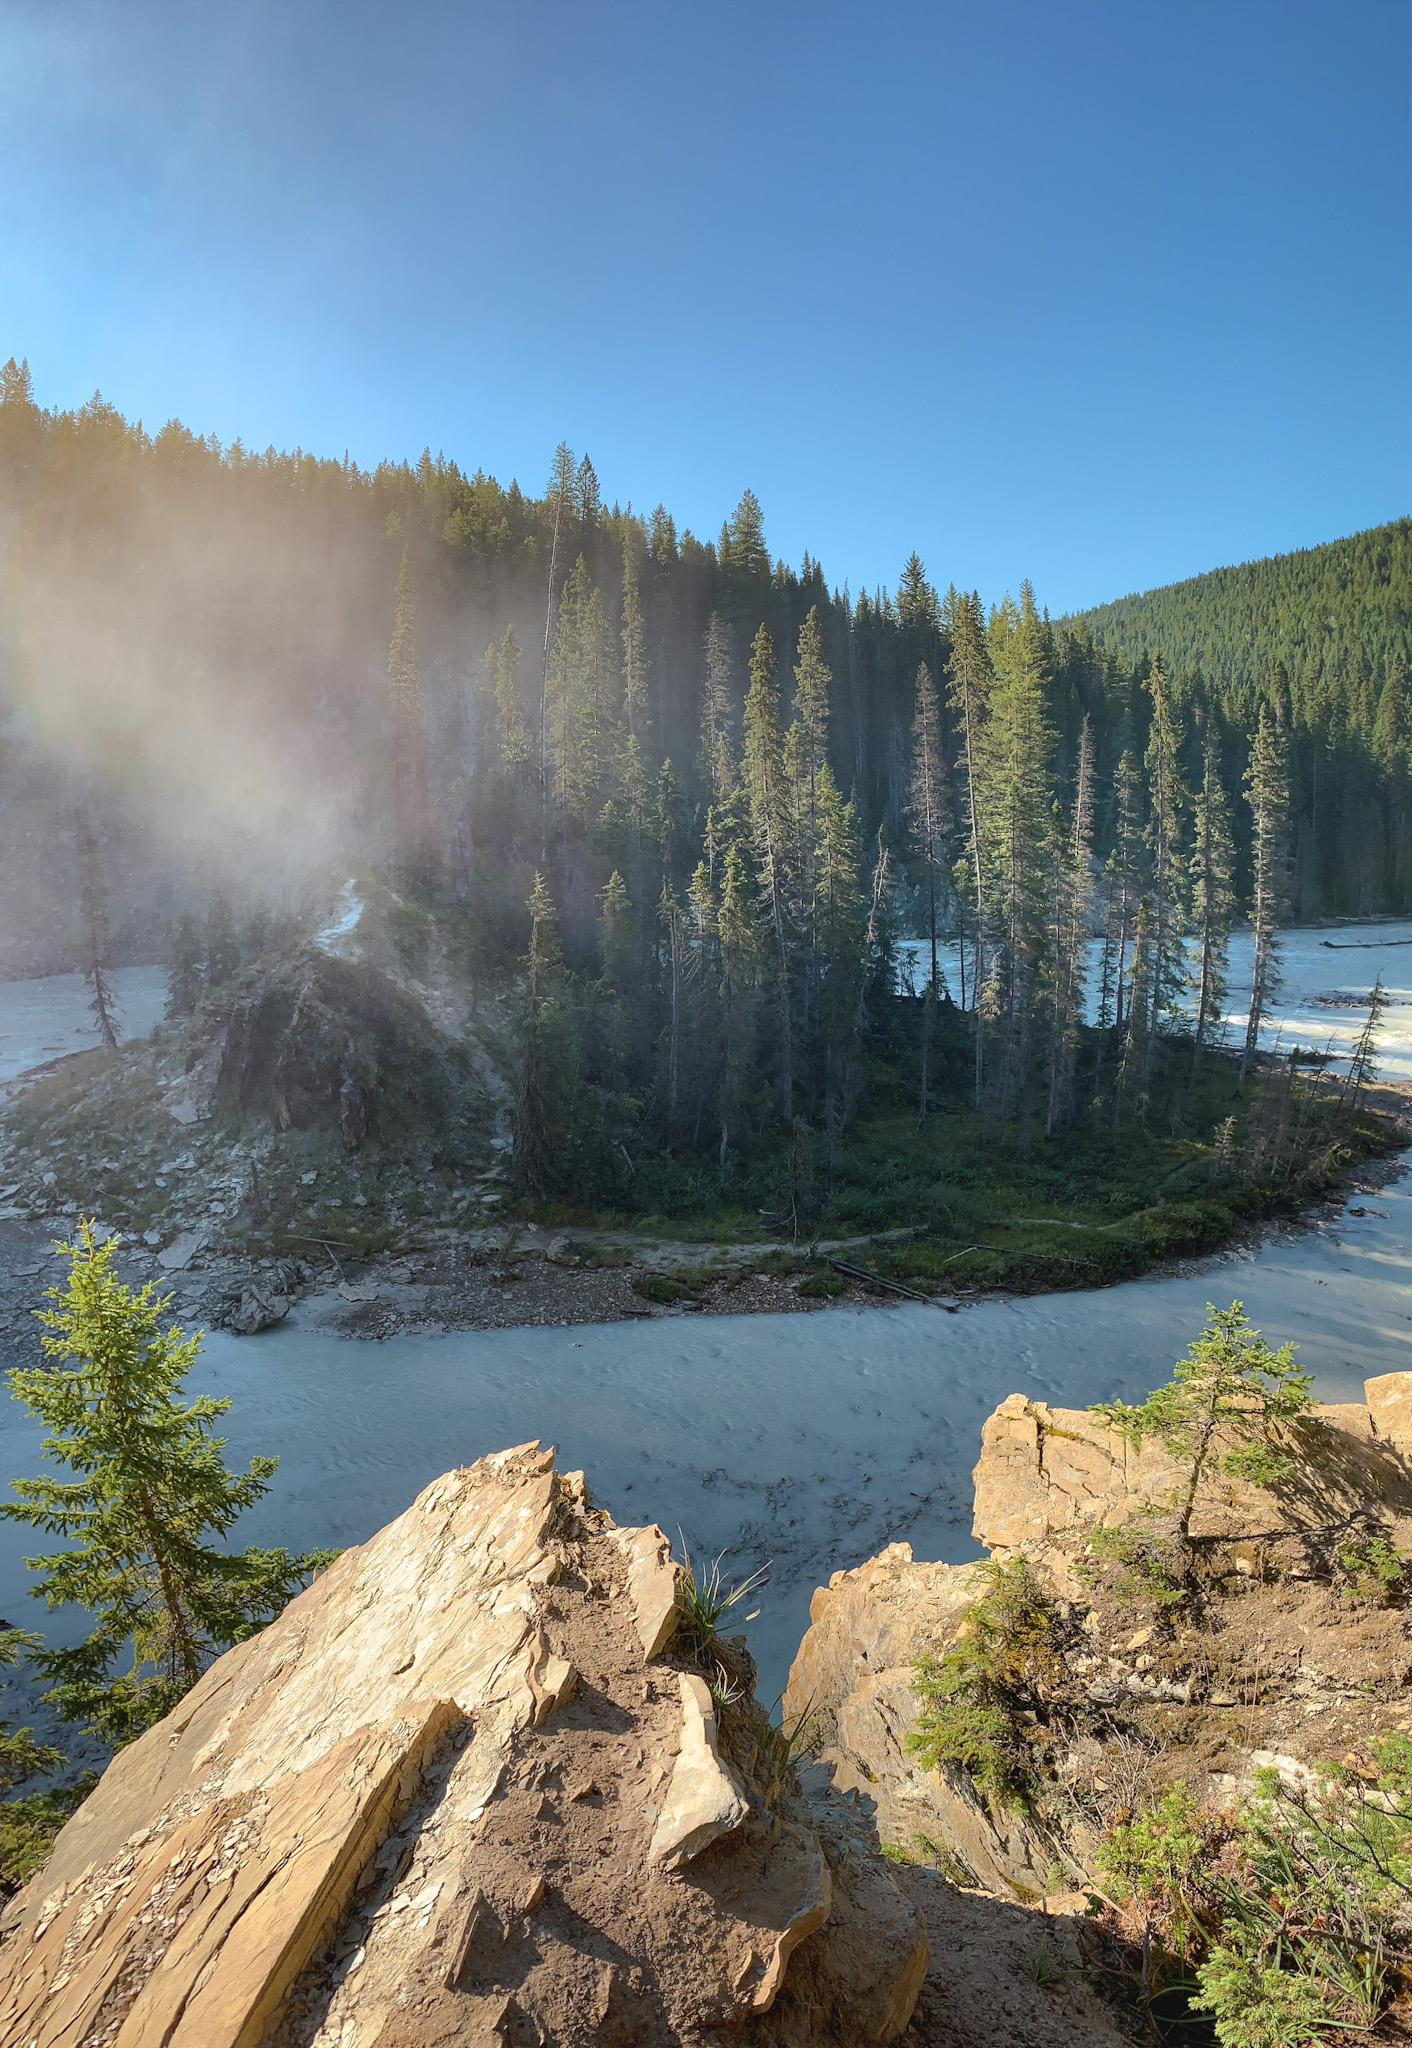 Wapta Falls in Yoho National Park, British Columbia